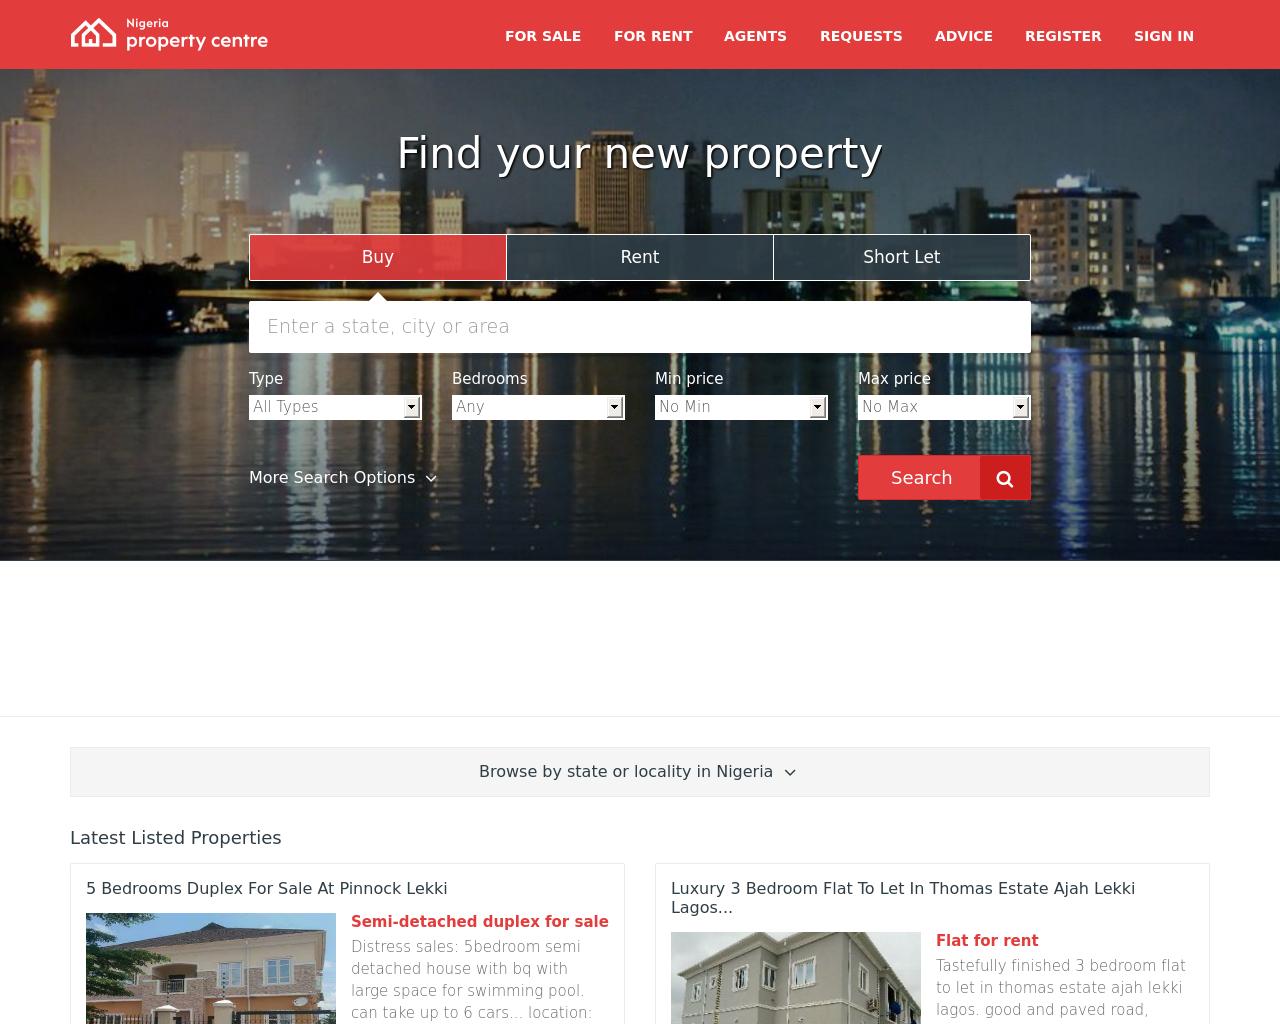 Nigeria-Property-Centre-Advertising-Reviews-Pricing